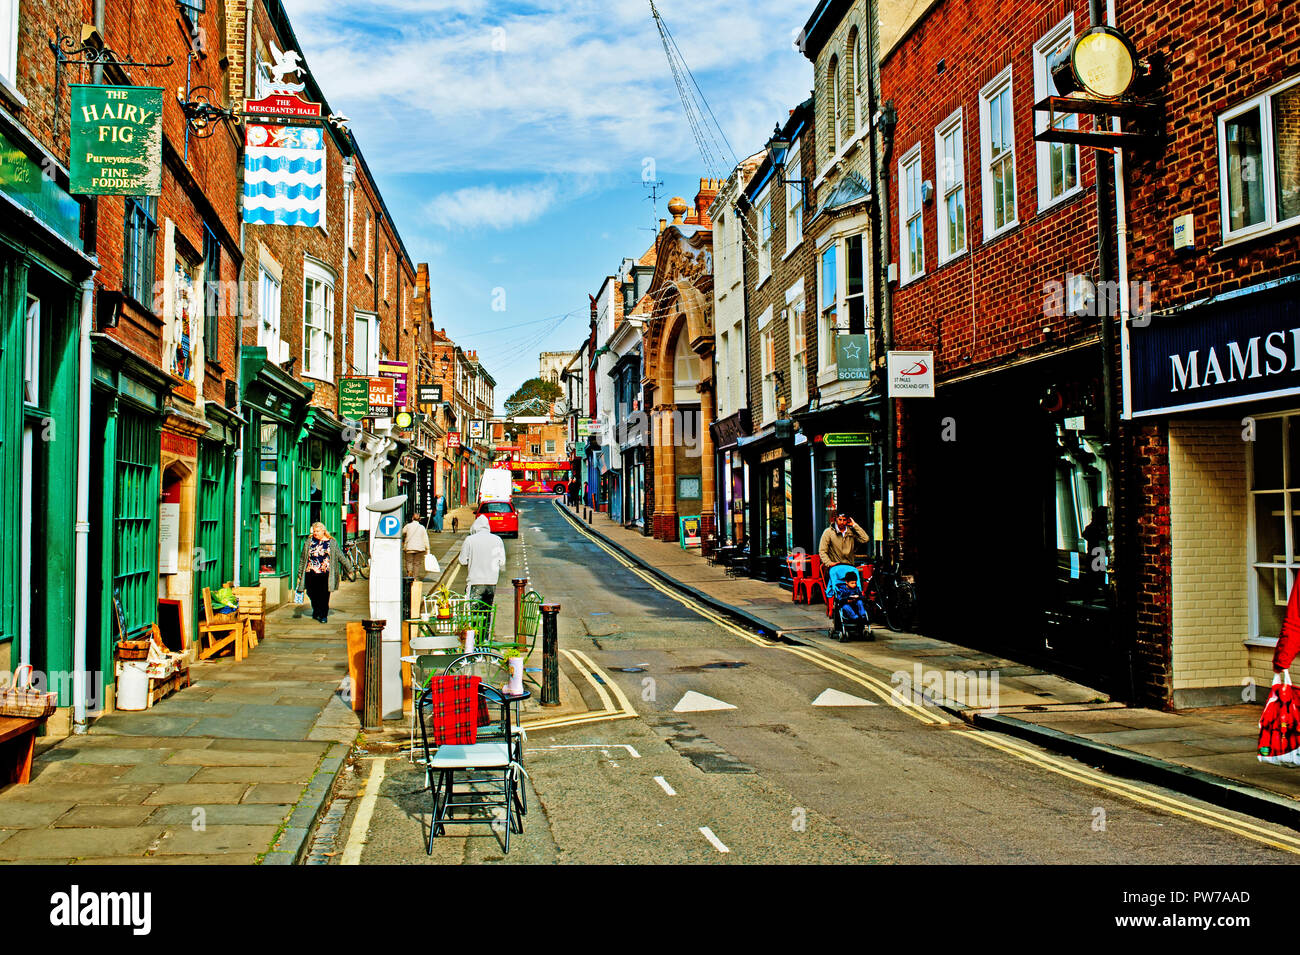 Fossgate, York, England - Stock Image